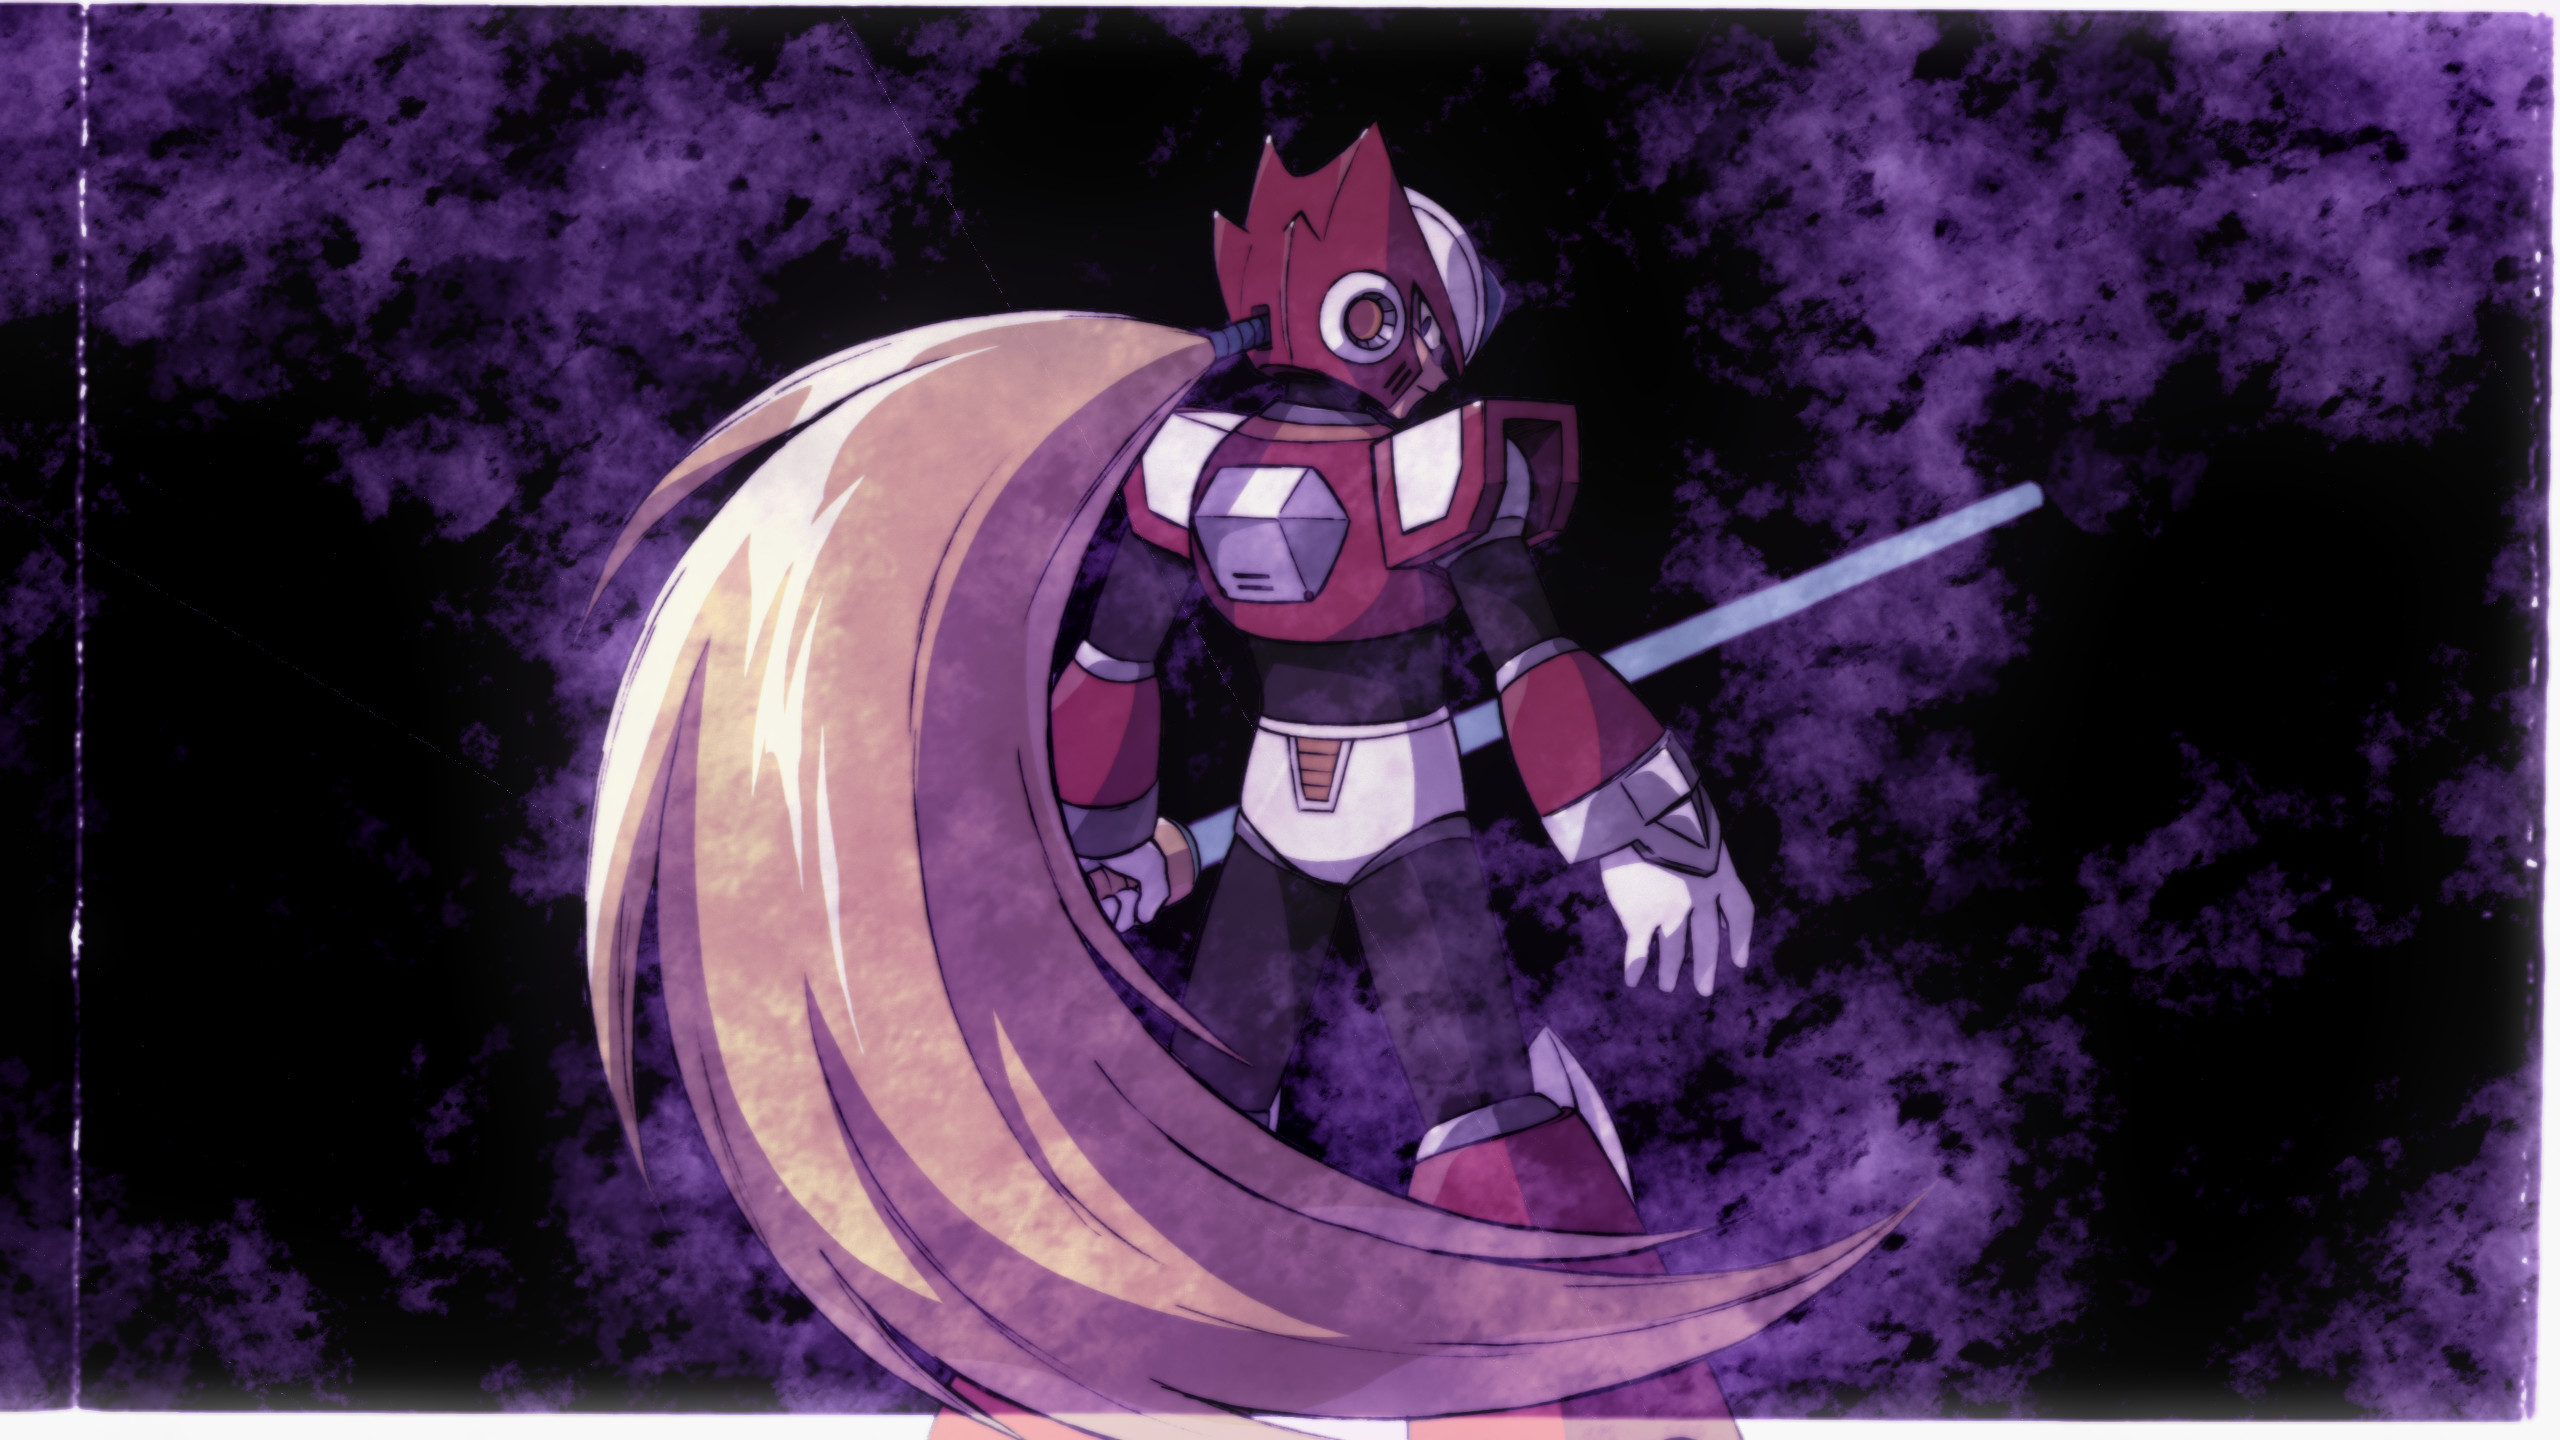 … Megaman X: ZERO[7] by Light-Rock